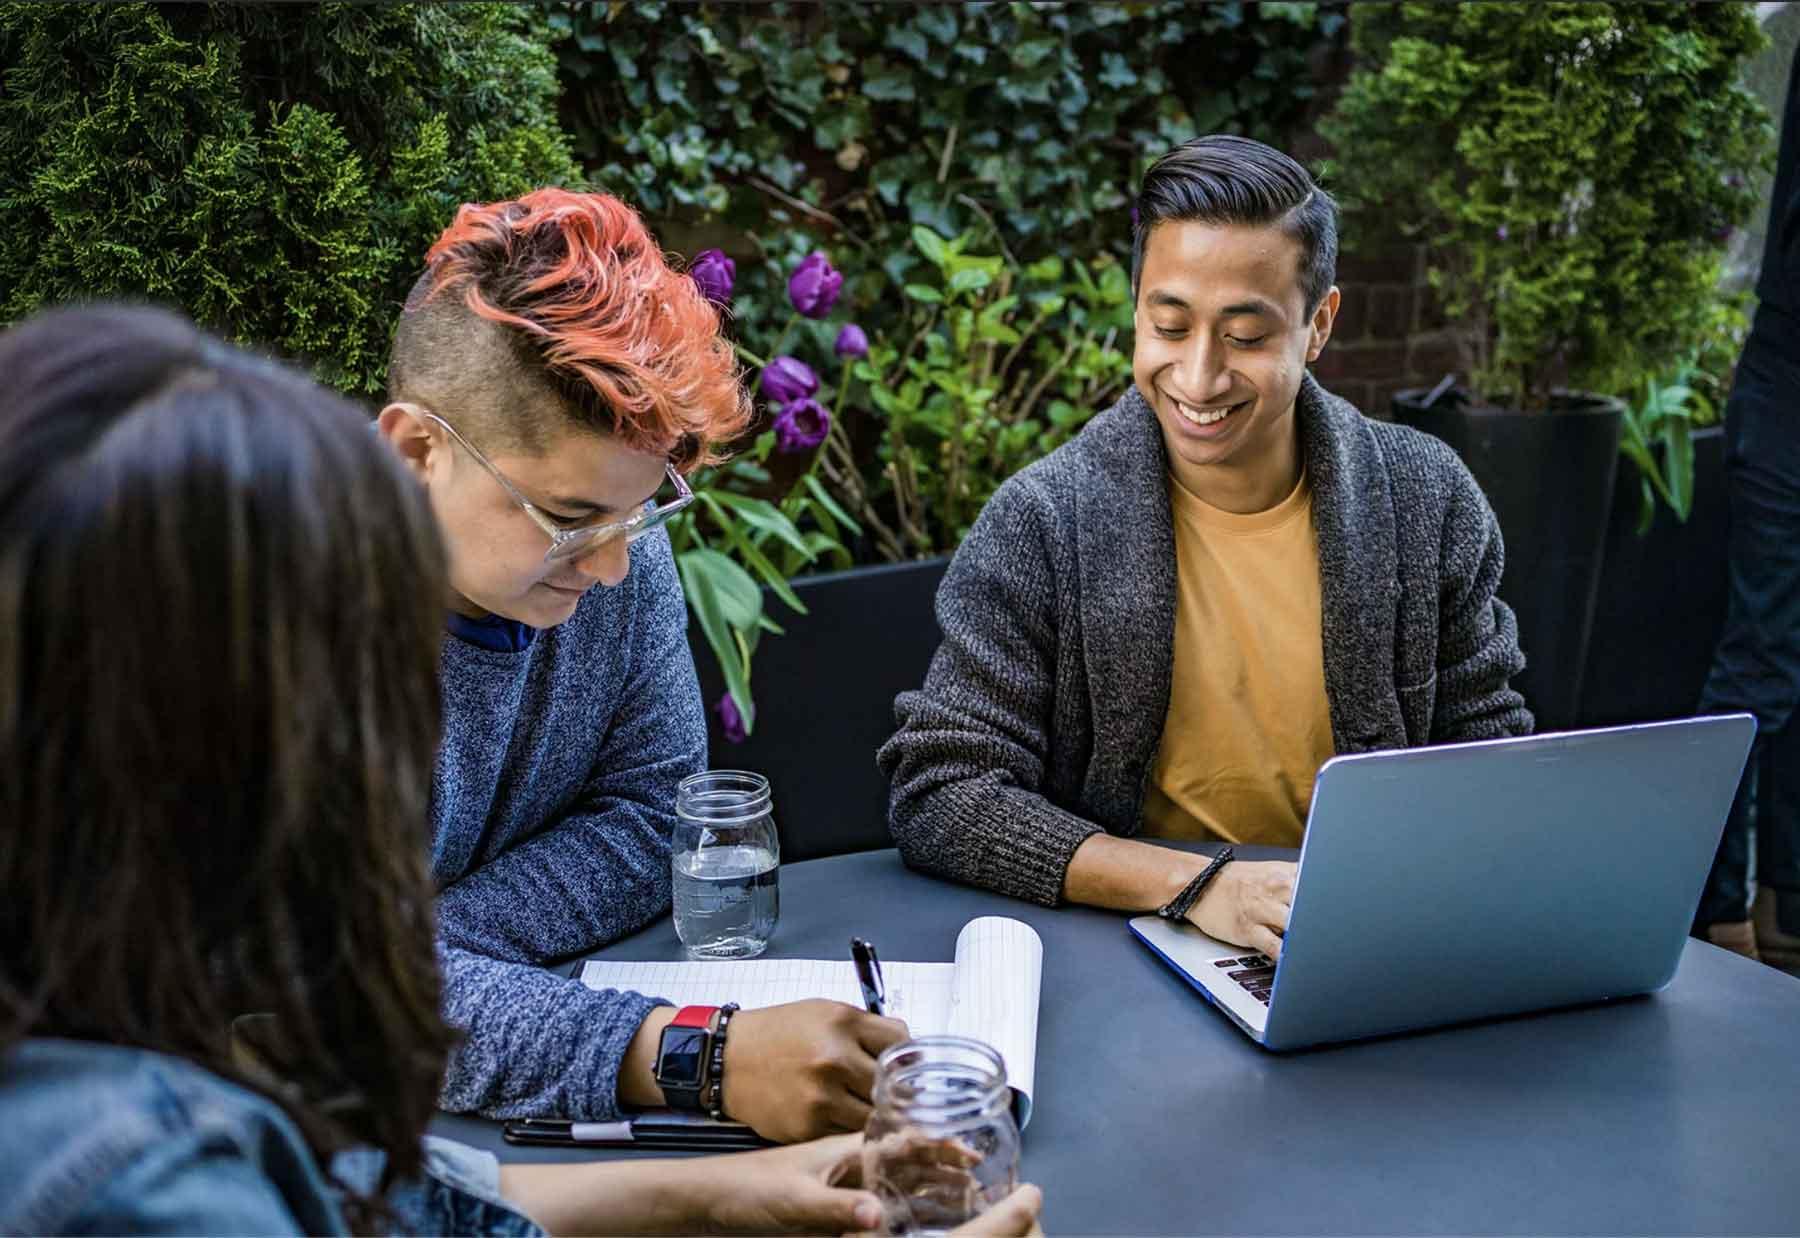 Sandy clients: diverse elastic freelance teams